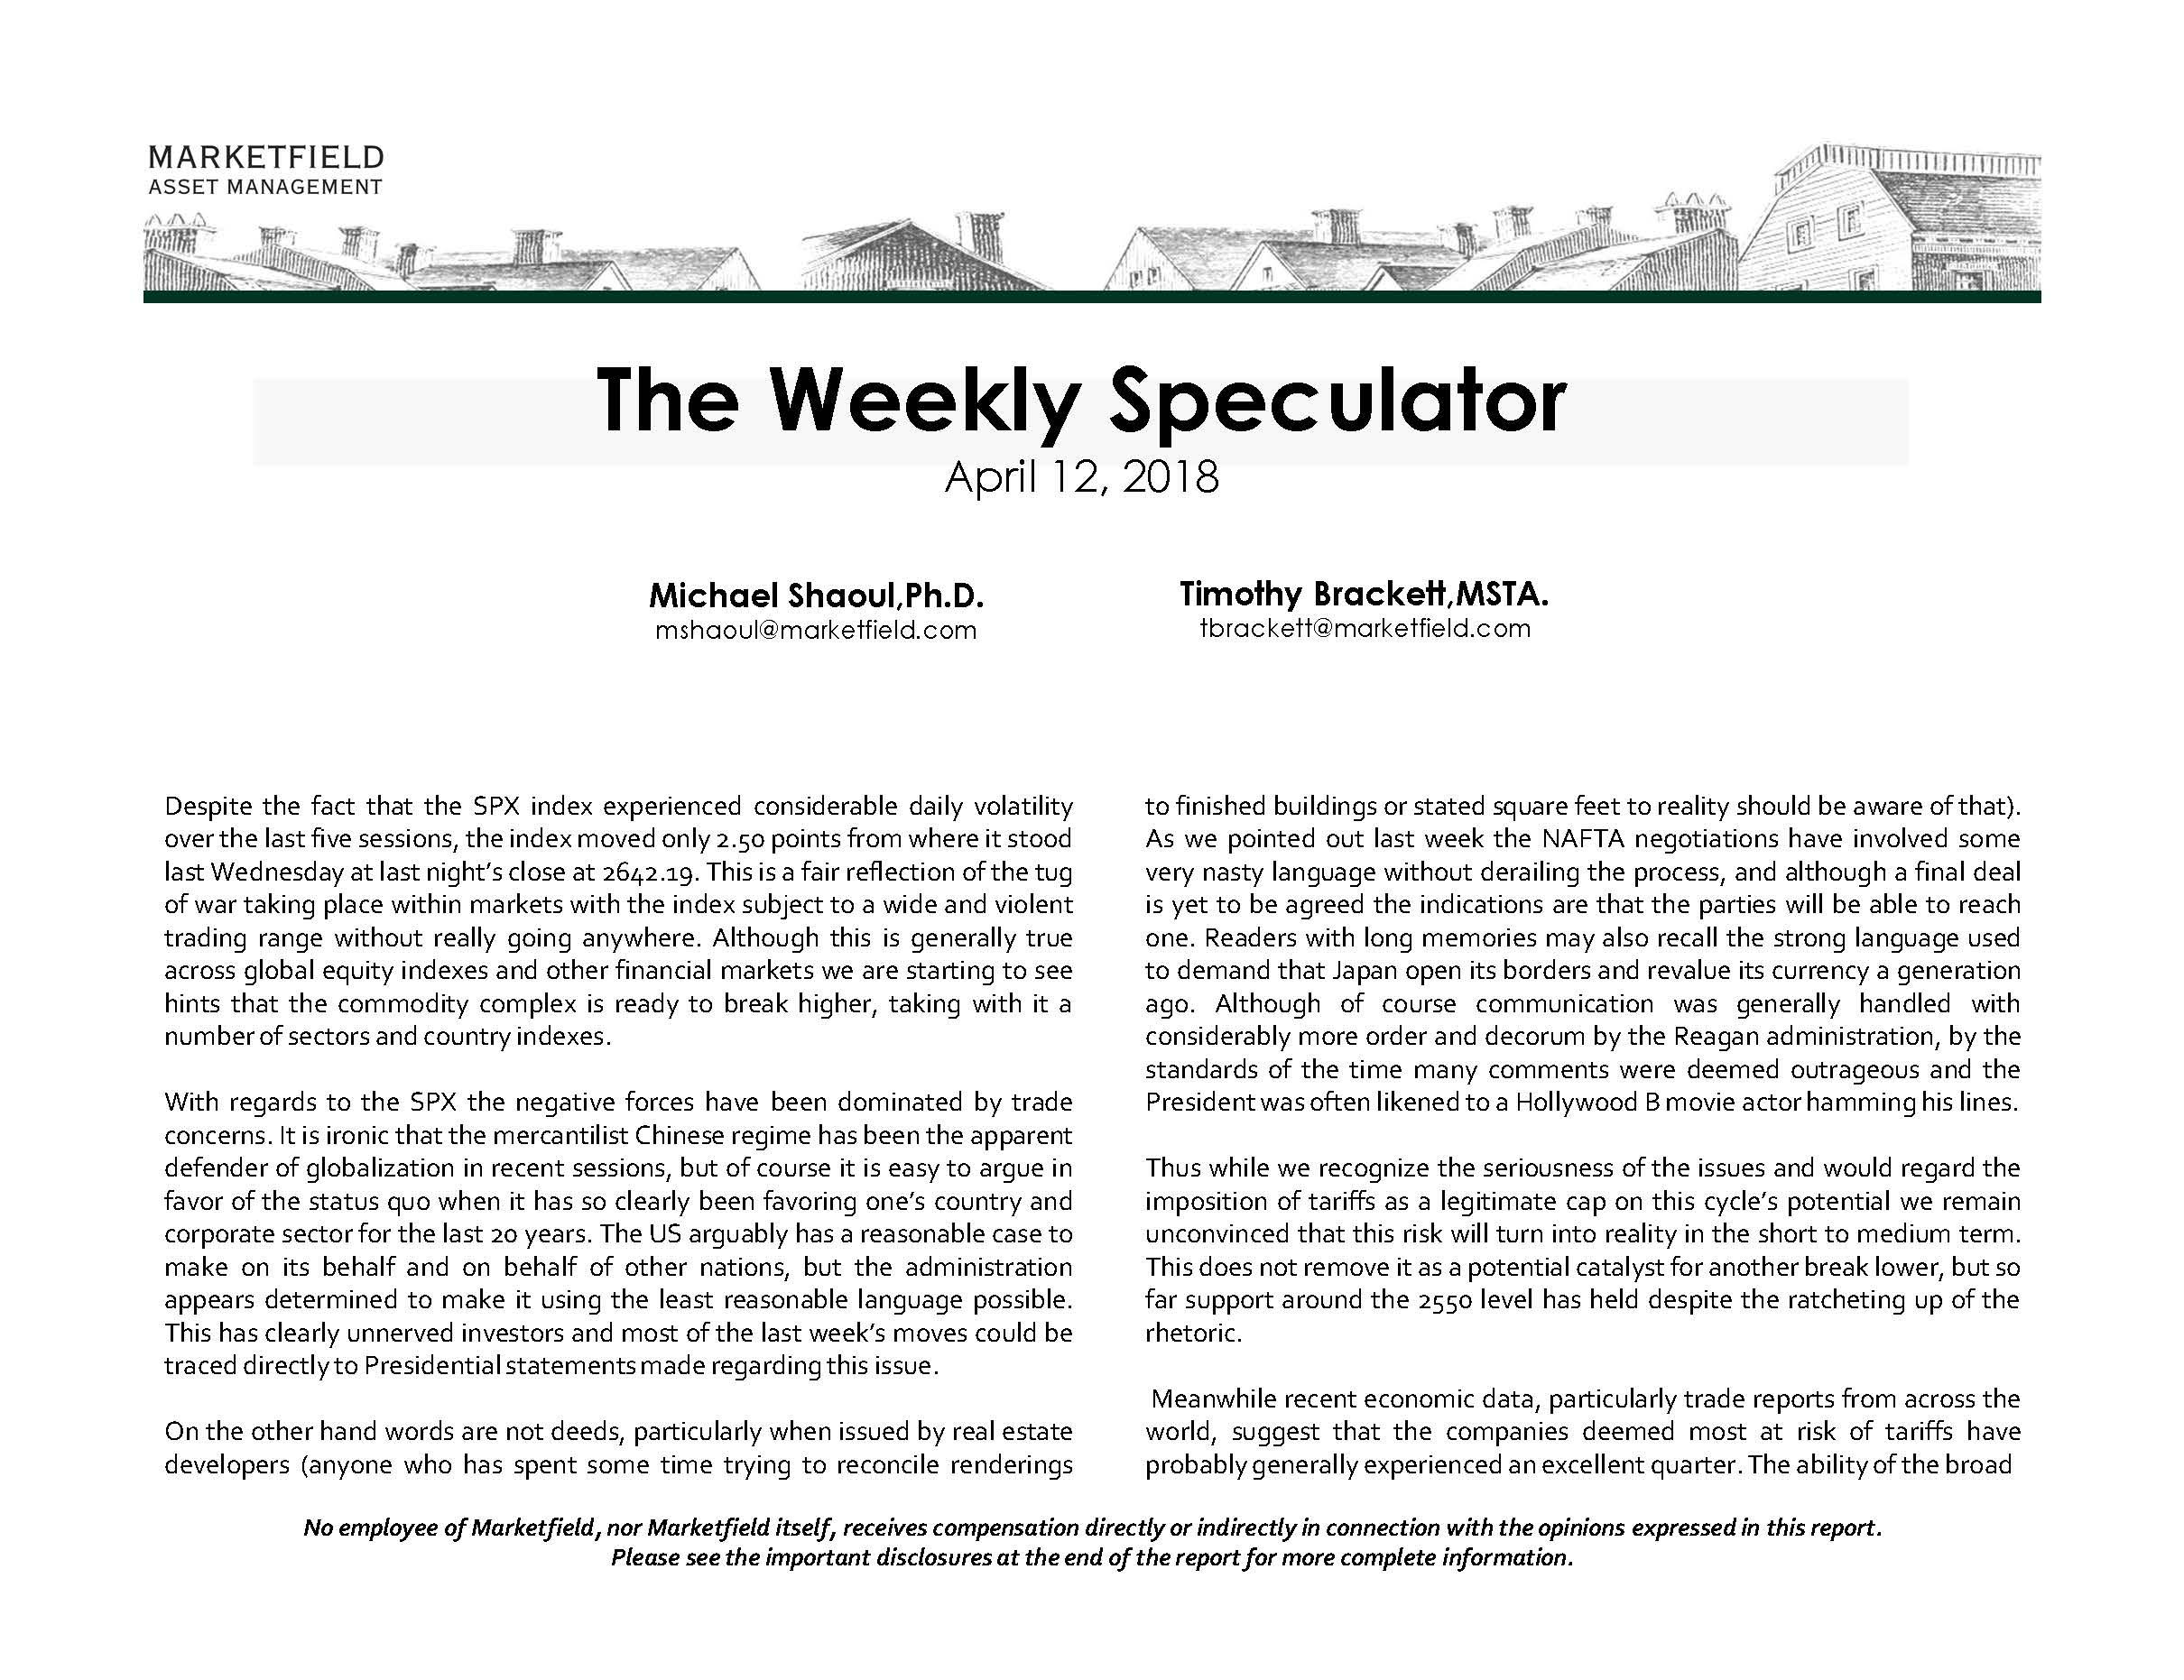 April 12_Marketfield Weekly Speculator_Page_01.jpg